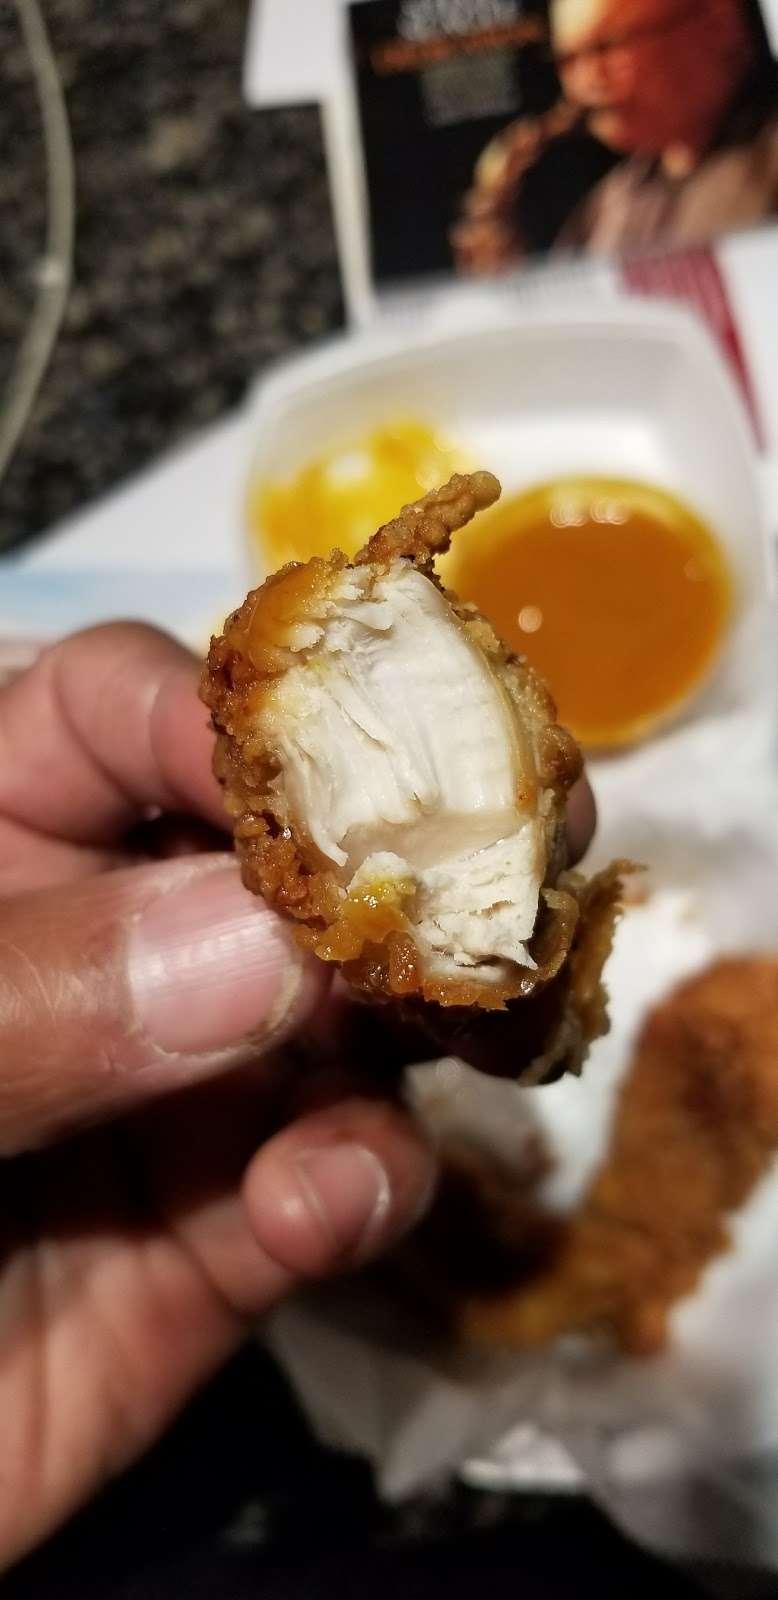 Chicken to Go - restaurant    Photo 2 of 10   Address: 1904 S Broad St, Trenton, NJ 08610, USA   Phone: (609) 989-1414